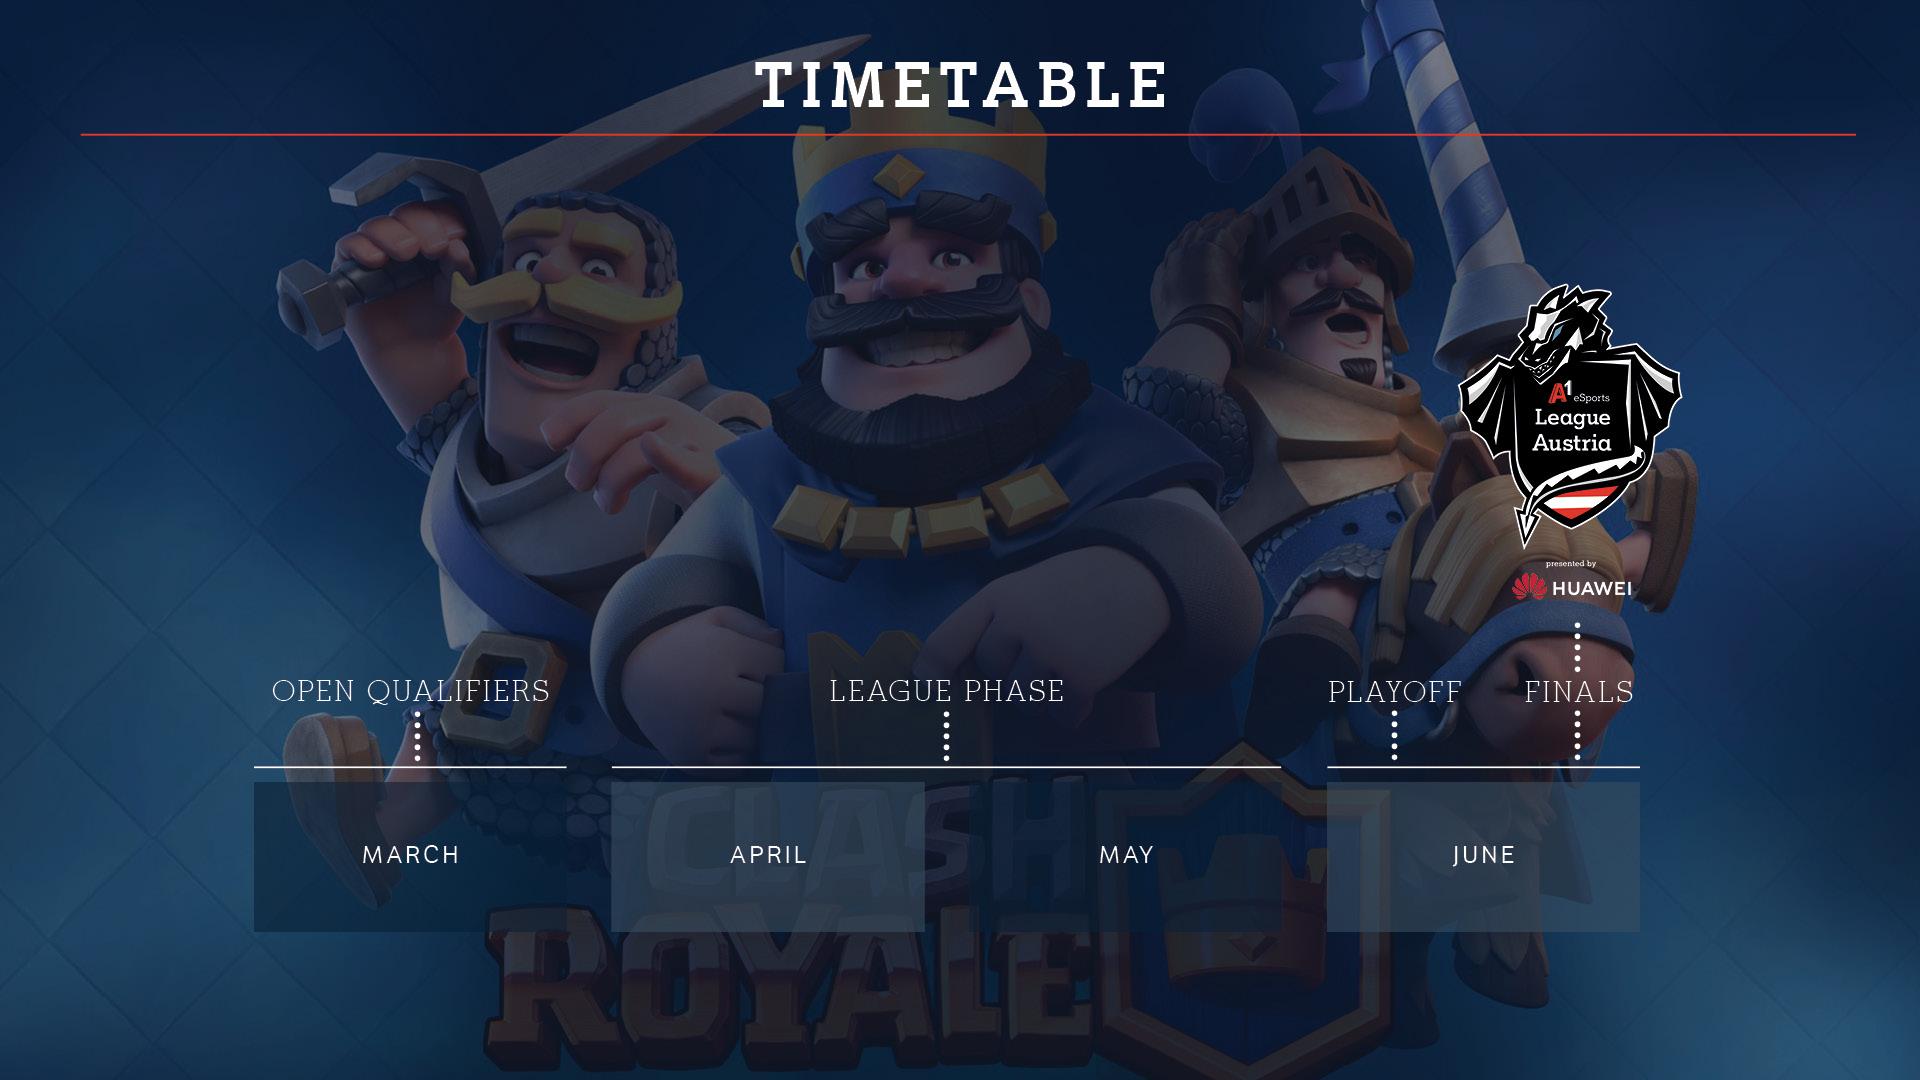 Ablauf Clash Royale A1 eSports League Austria